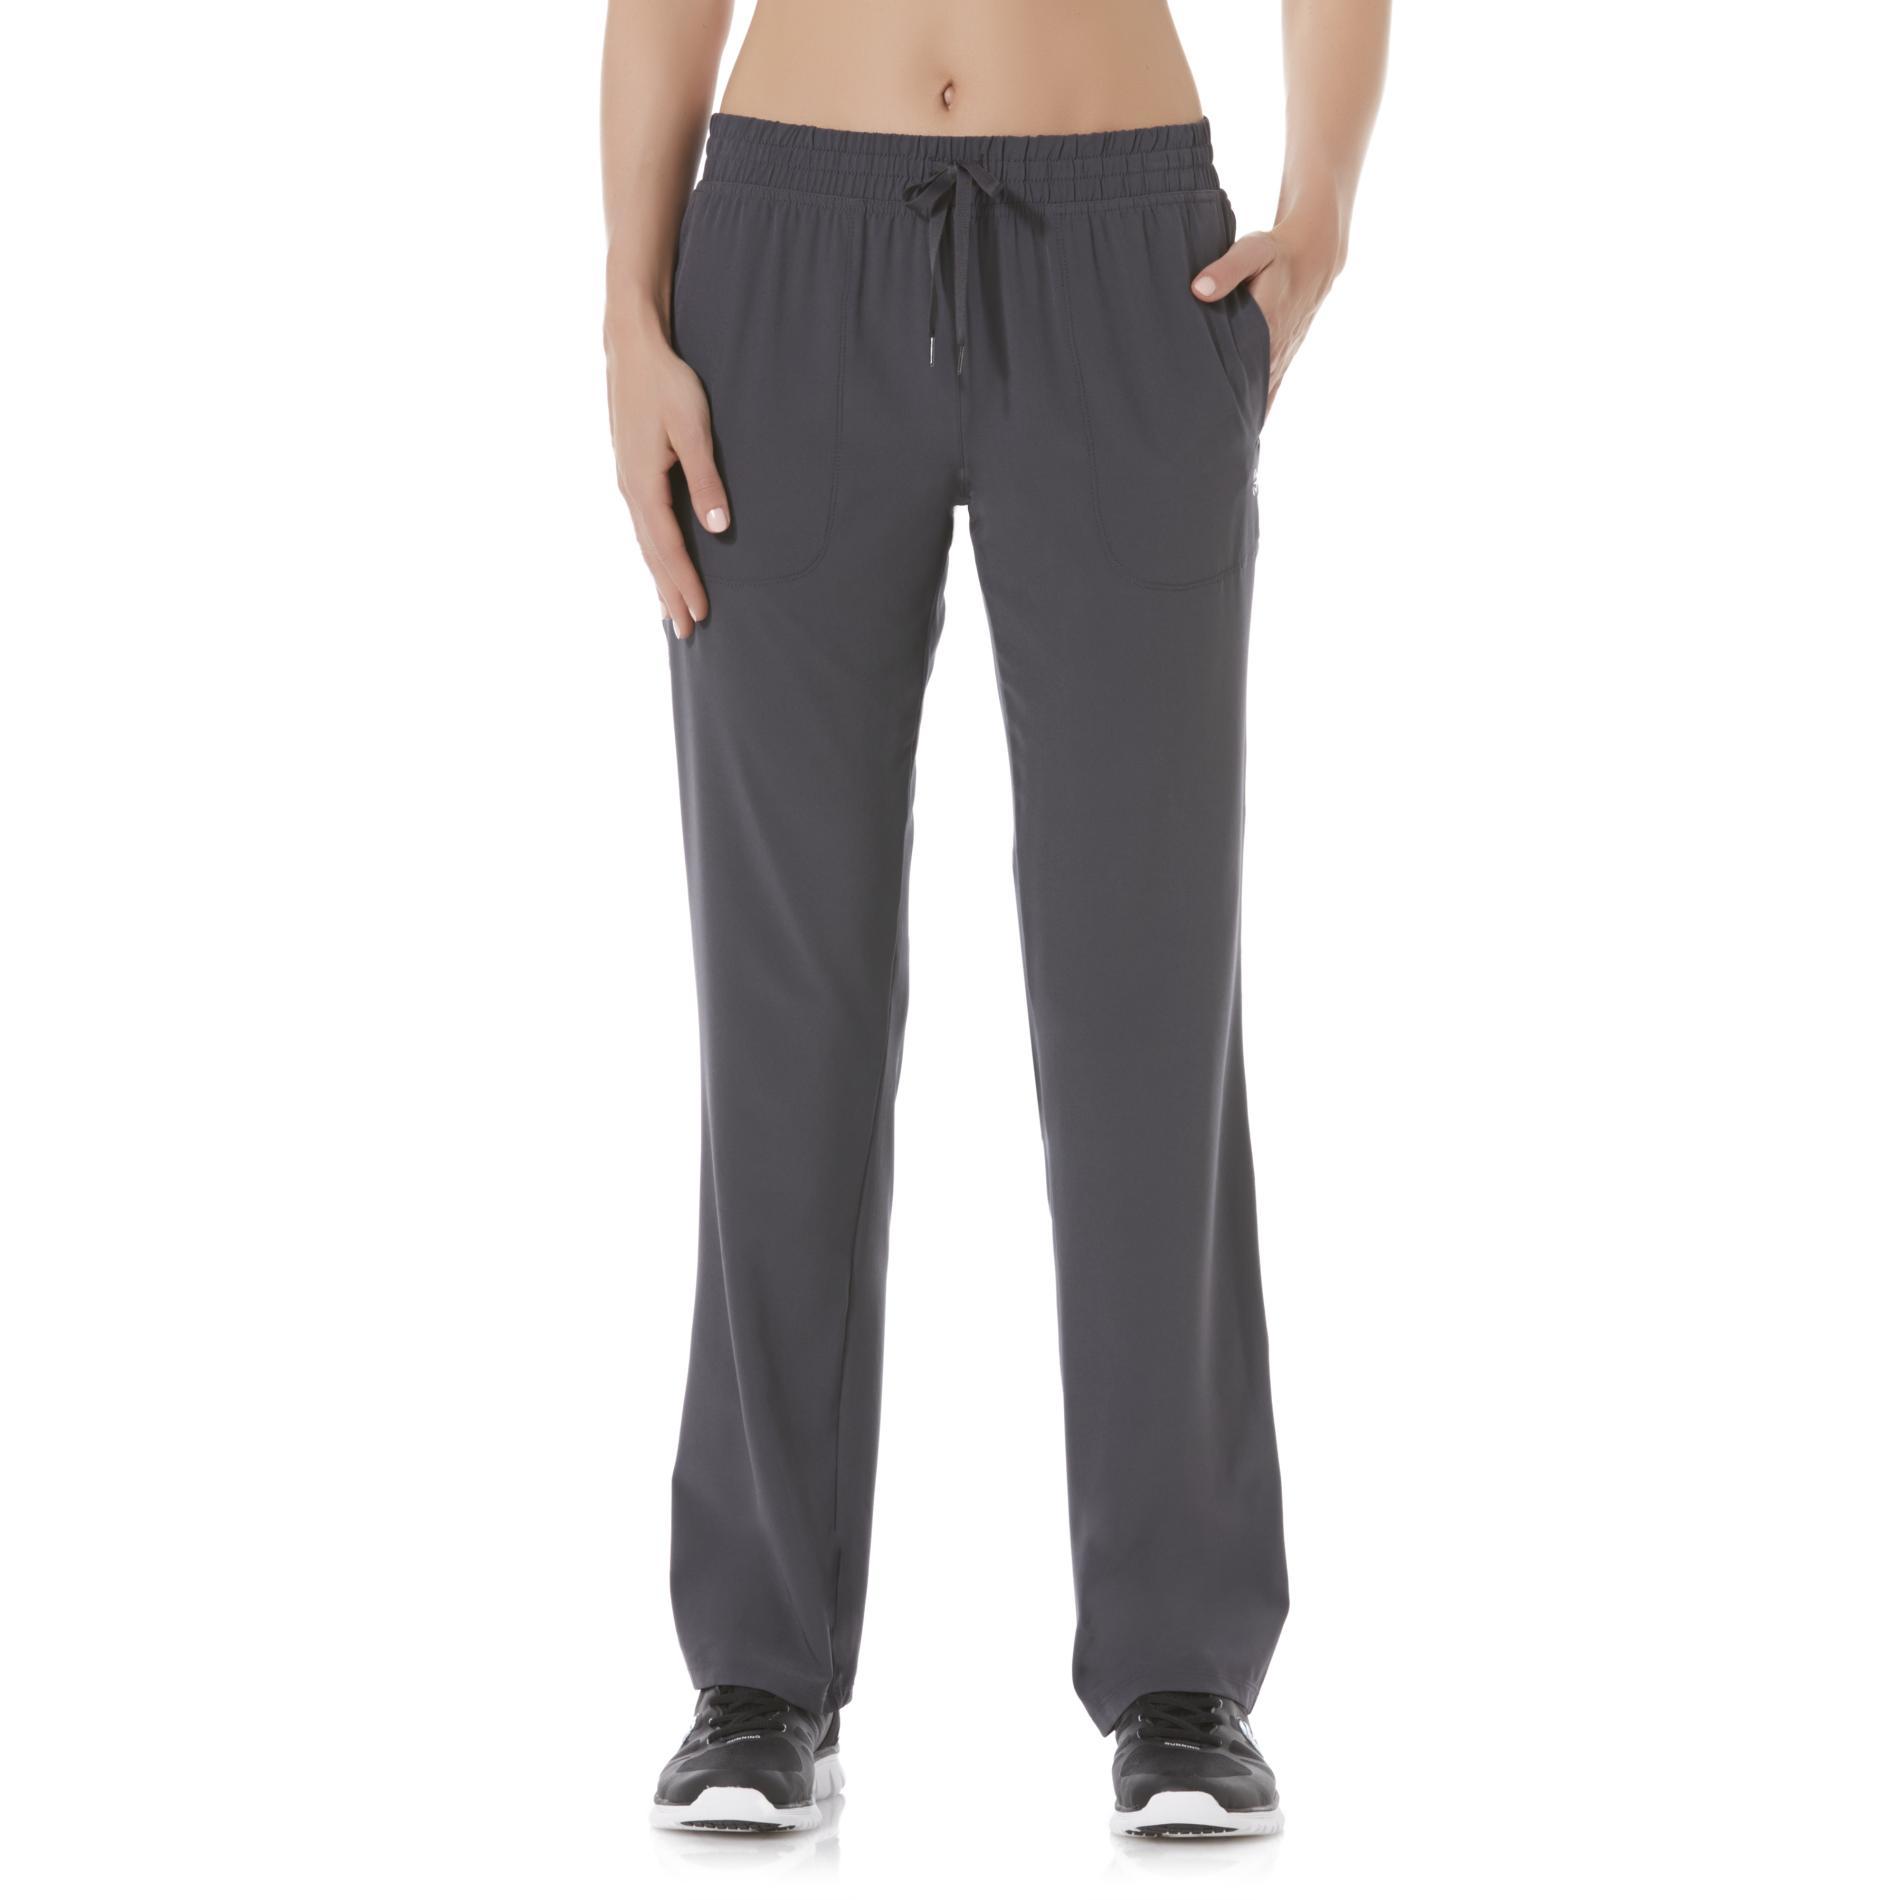 Impact by Jillian Michaels Women's Woven Performance Pants